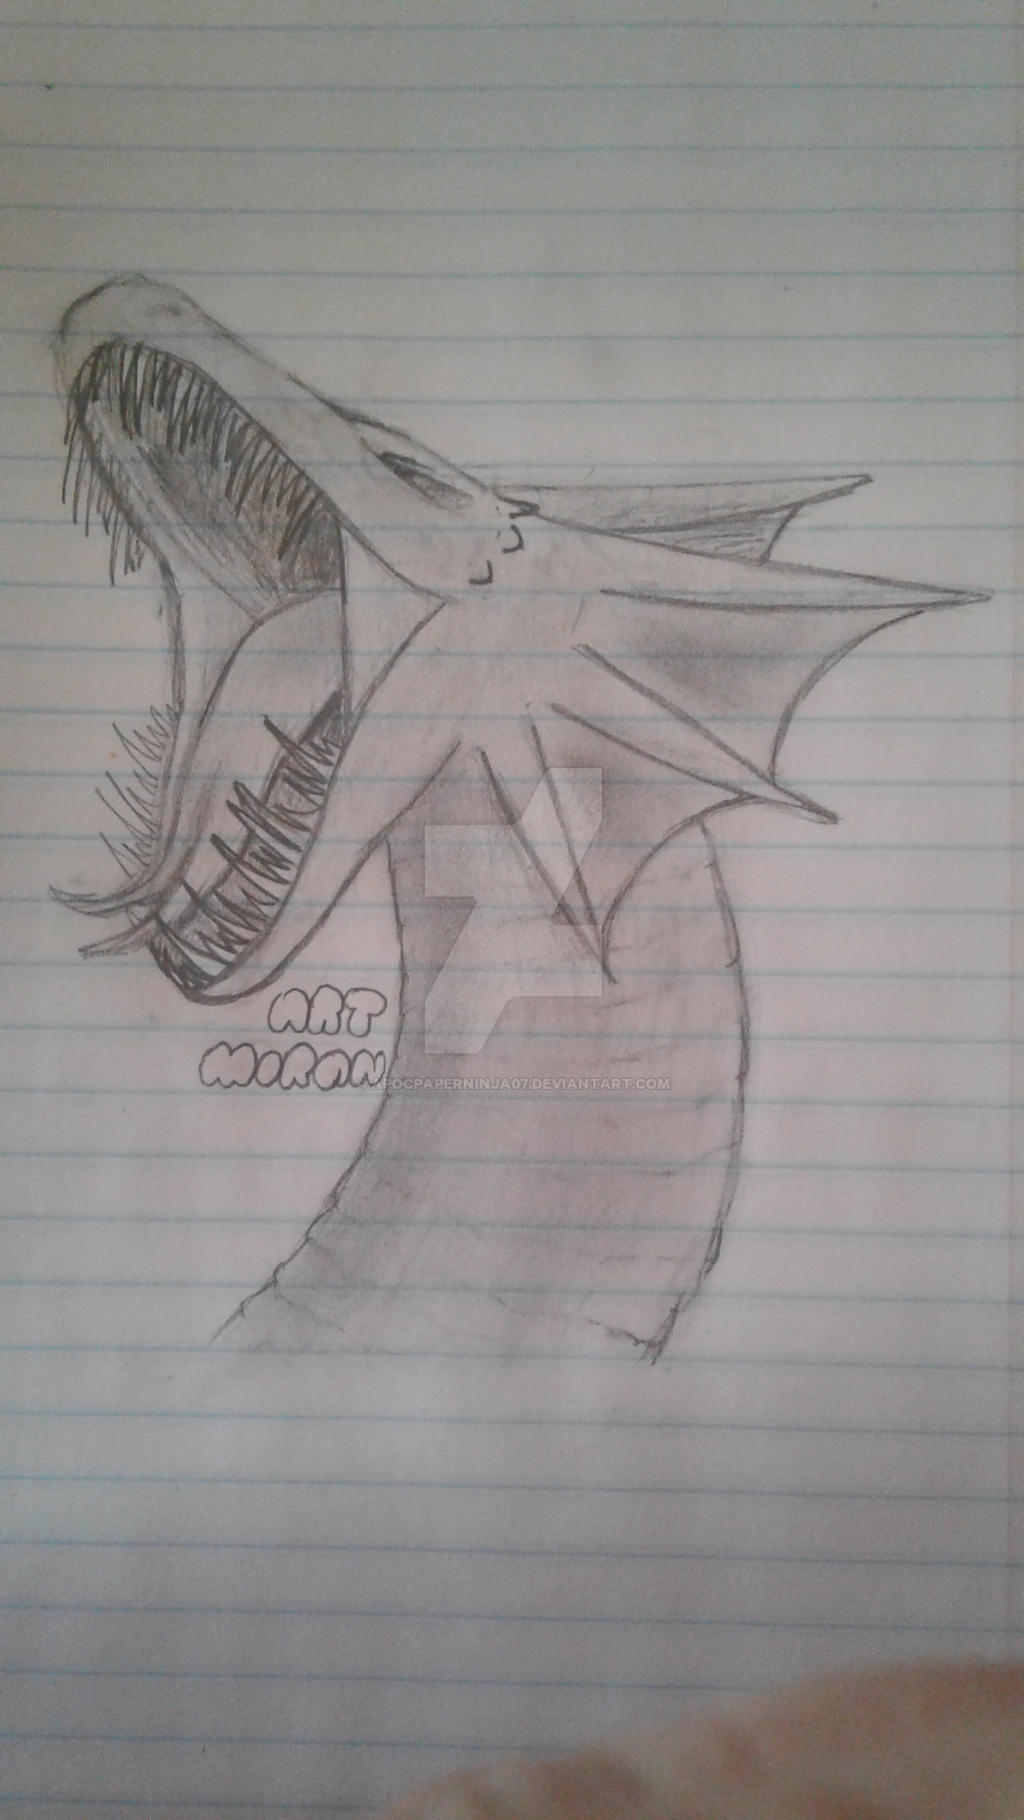 Sea dragon by Ninja--7